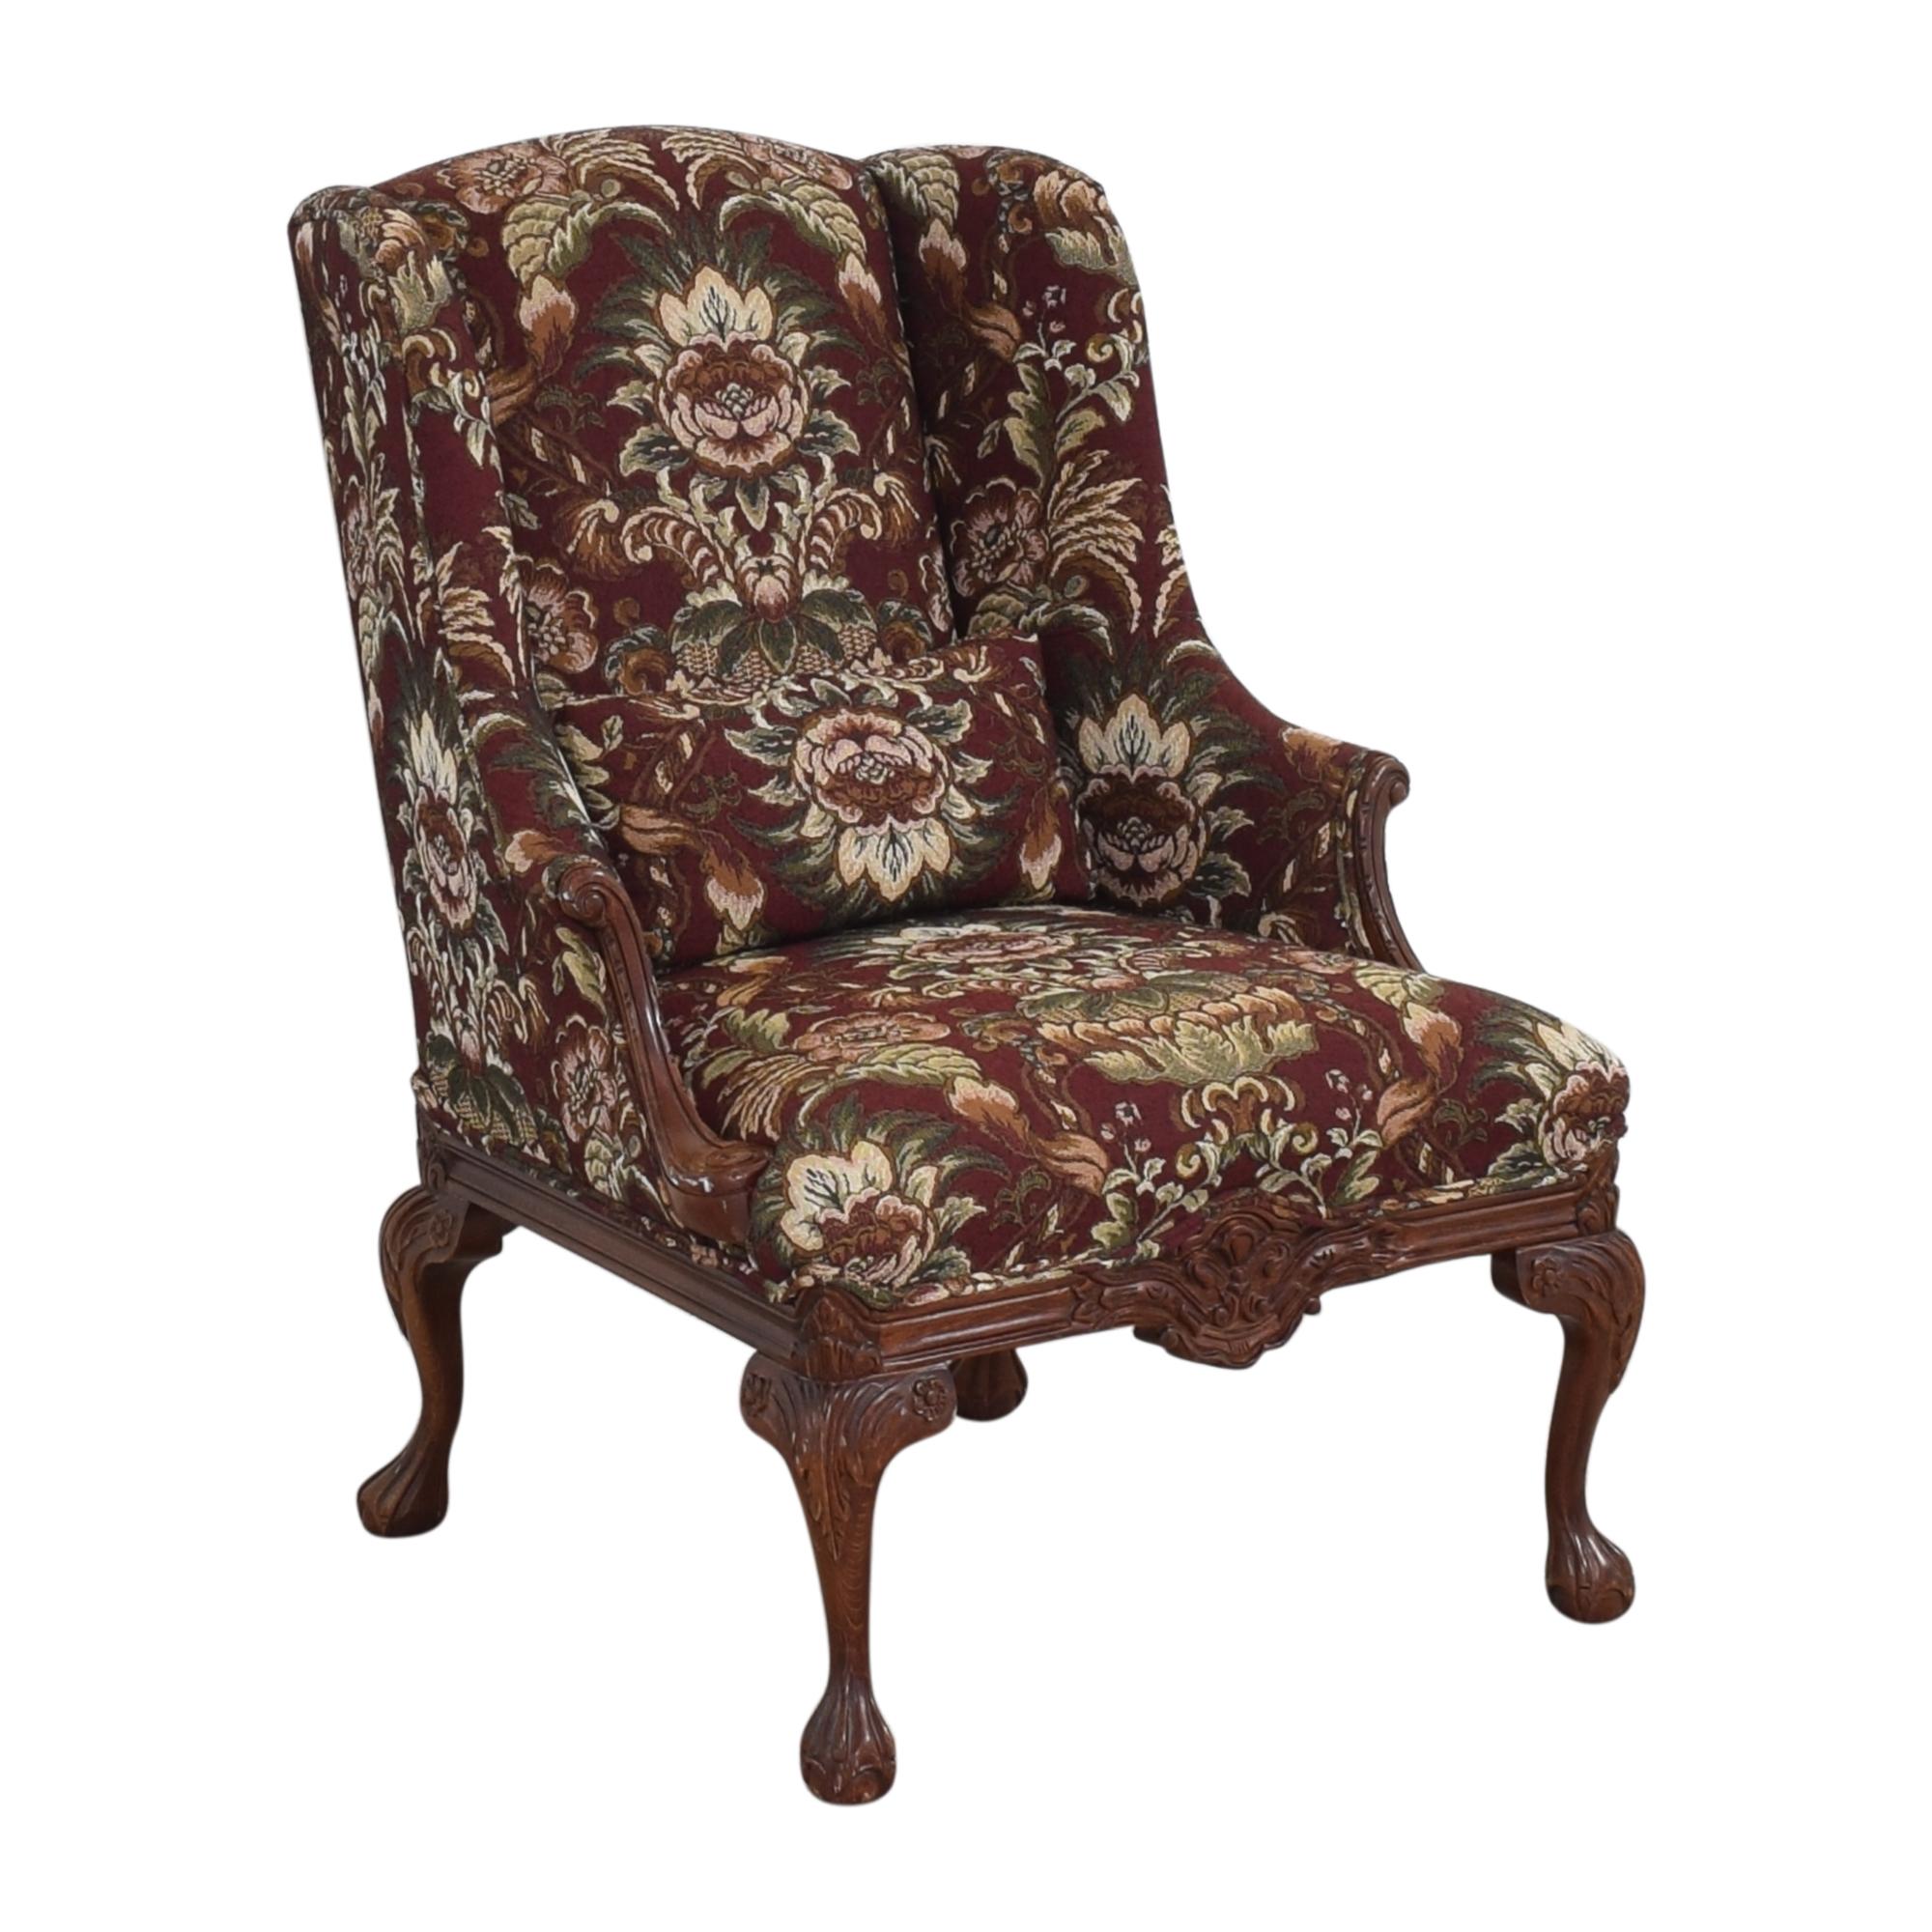 Drexel Heritage Drexel Heritage Wing Back Floral Chair multi